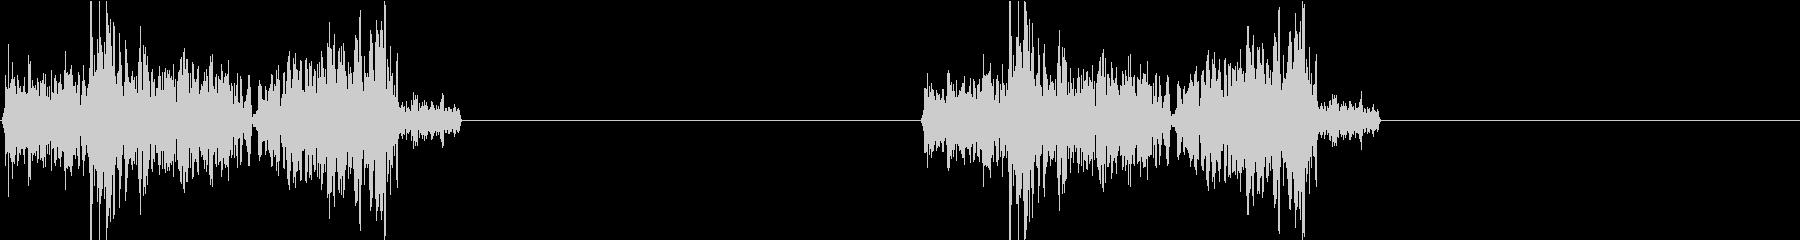 DJプレイ スクラッチ・ノイズ 72の未再生の波形